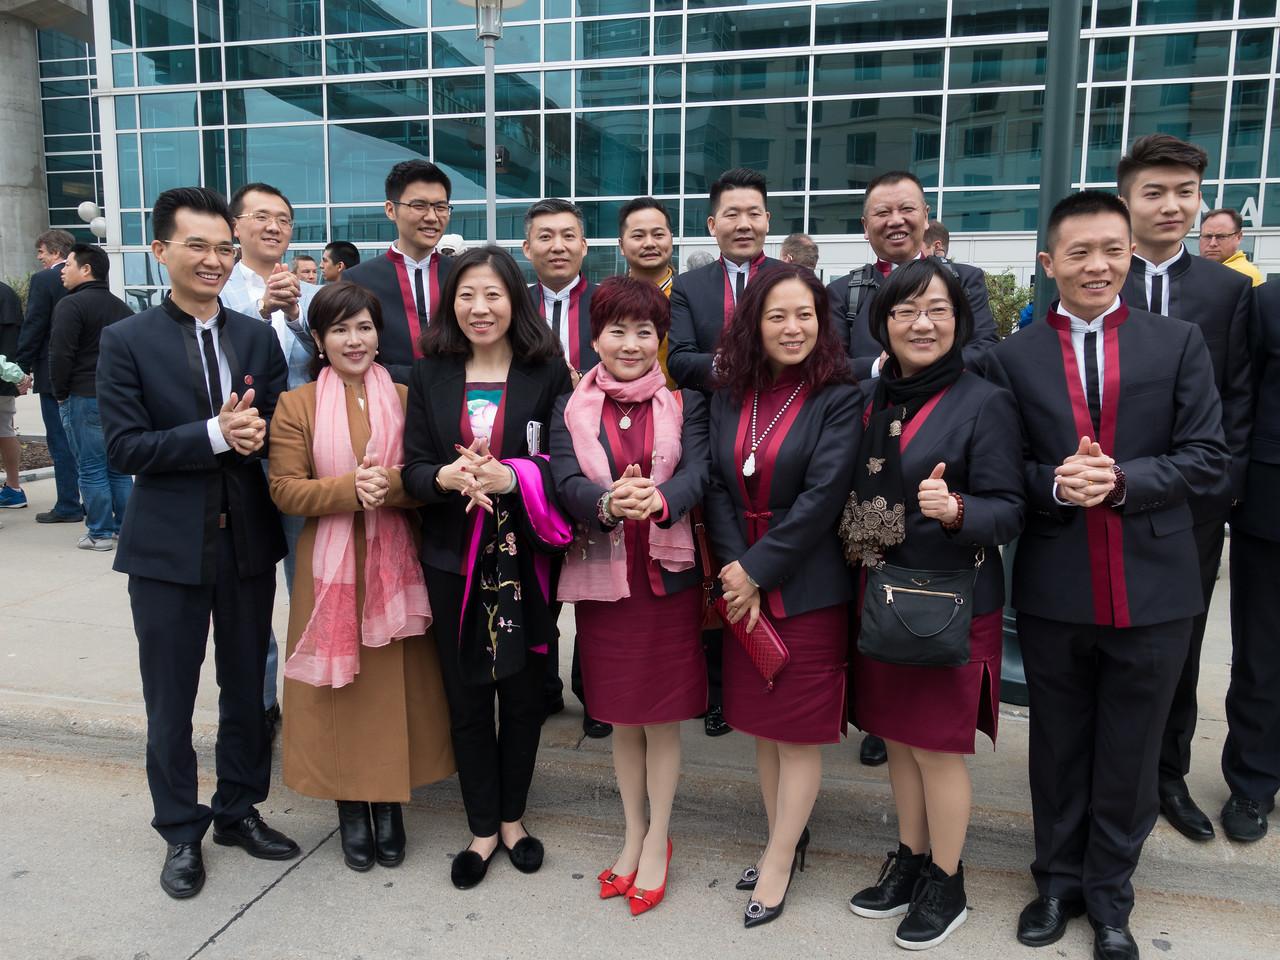 Shareholders, Berkshire Hathaway Annual Meeting, Omaha Nebraska